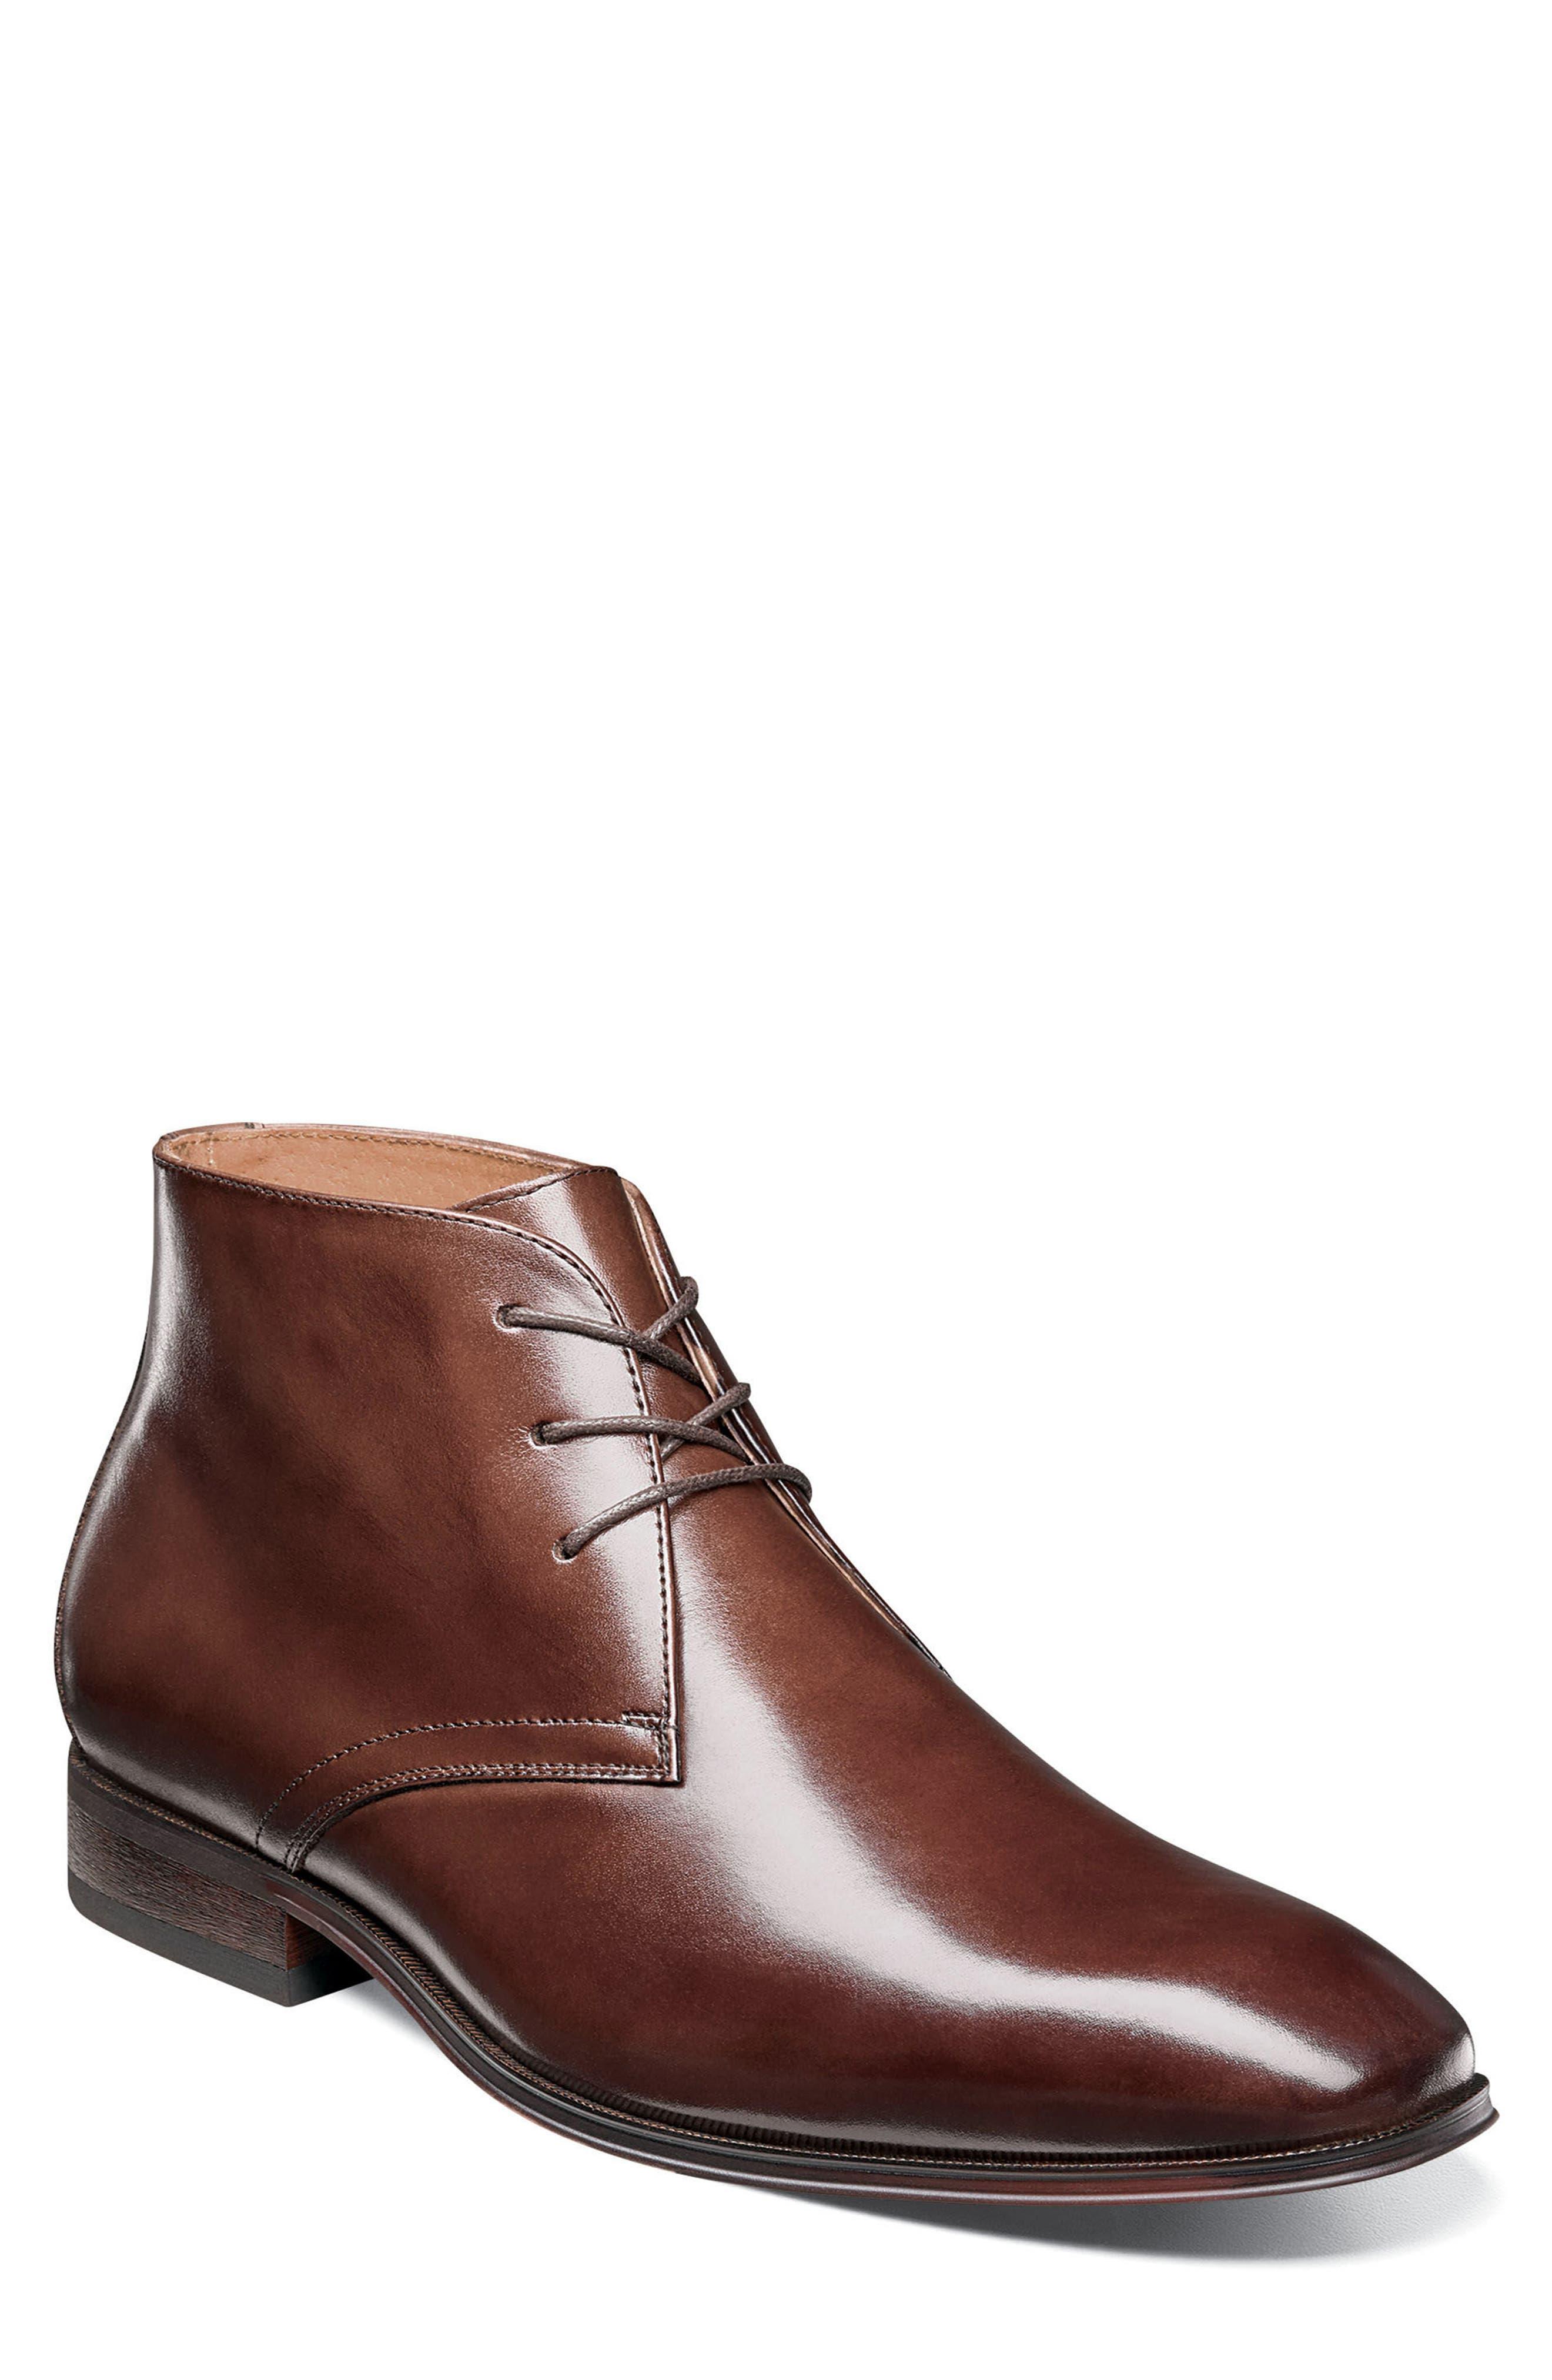 Corbetta Chukka Boot,                             Main thumbnail 1, color,                             Cognac Leather